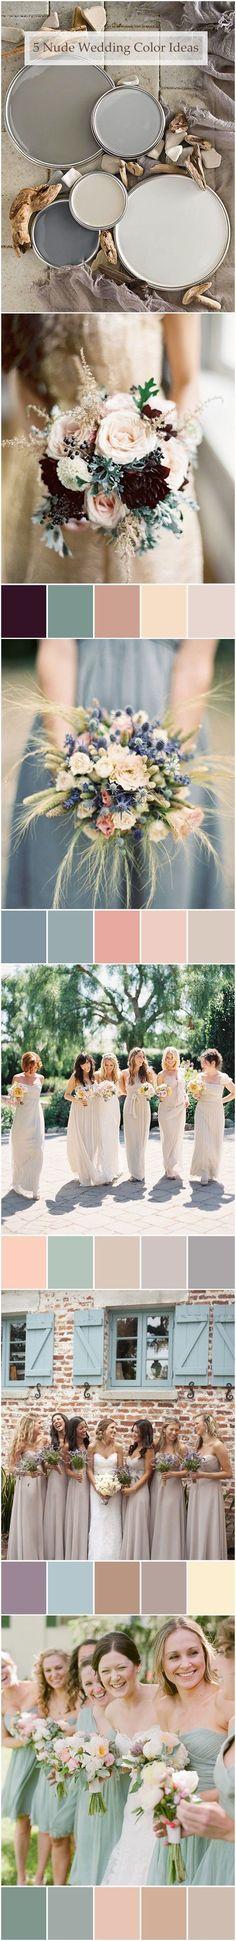 top 6 trending nude neutral wedding color ideas #weddingcolors #weddingideas | thebeautyspotqld.com.au